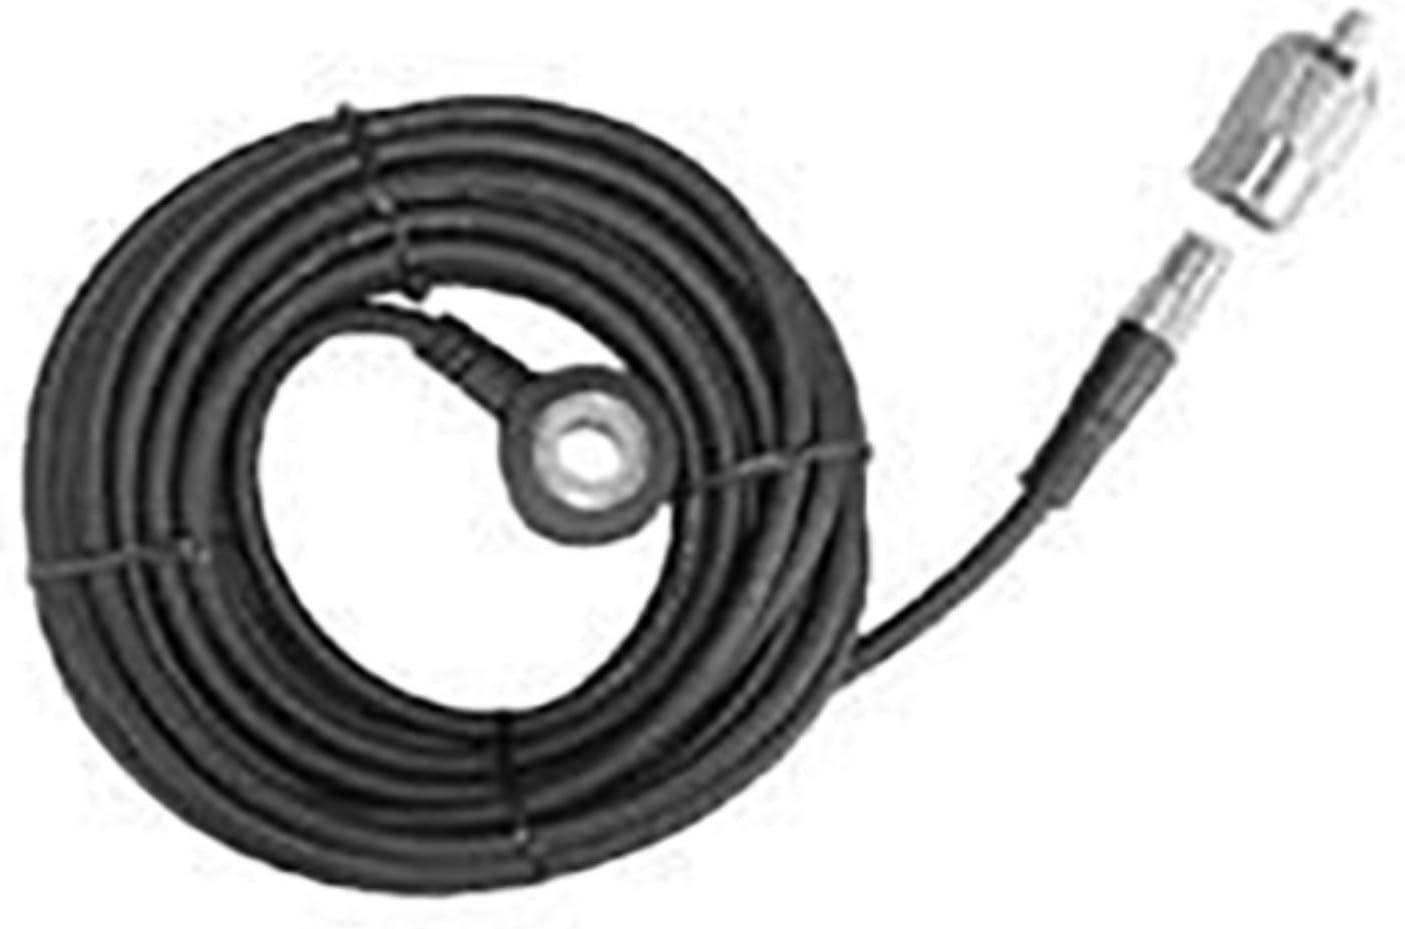 Firestik Antenna FireStik MU8R18 18-Foot Single Antenna Coaxial Cable